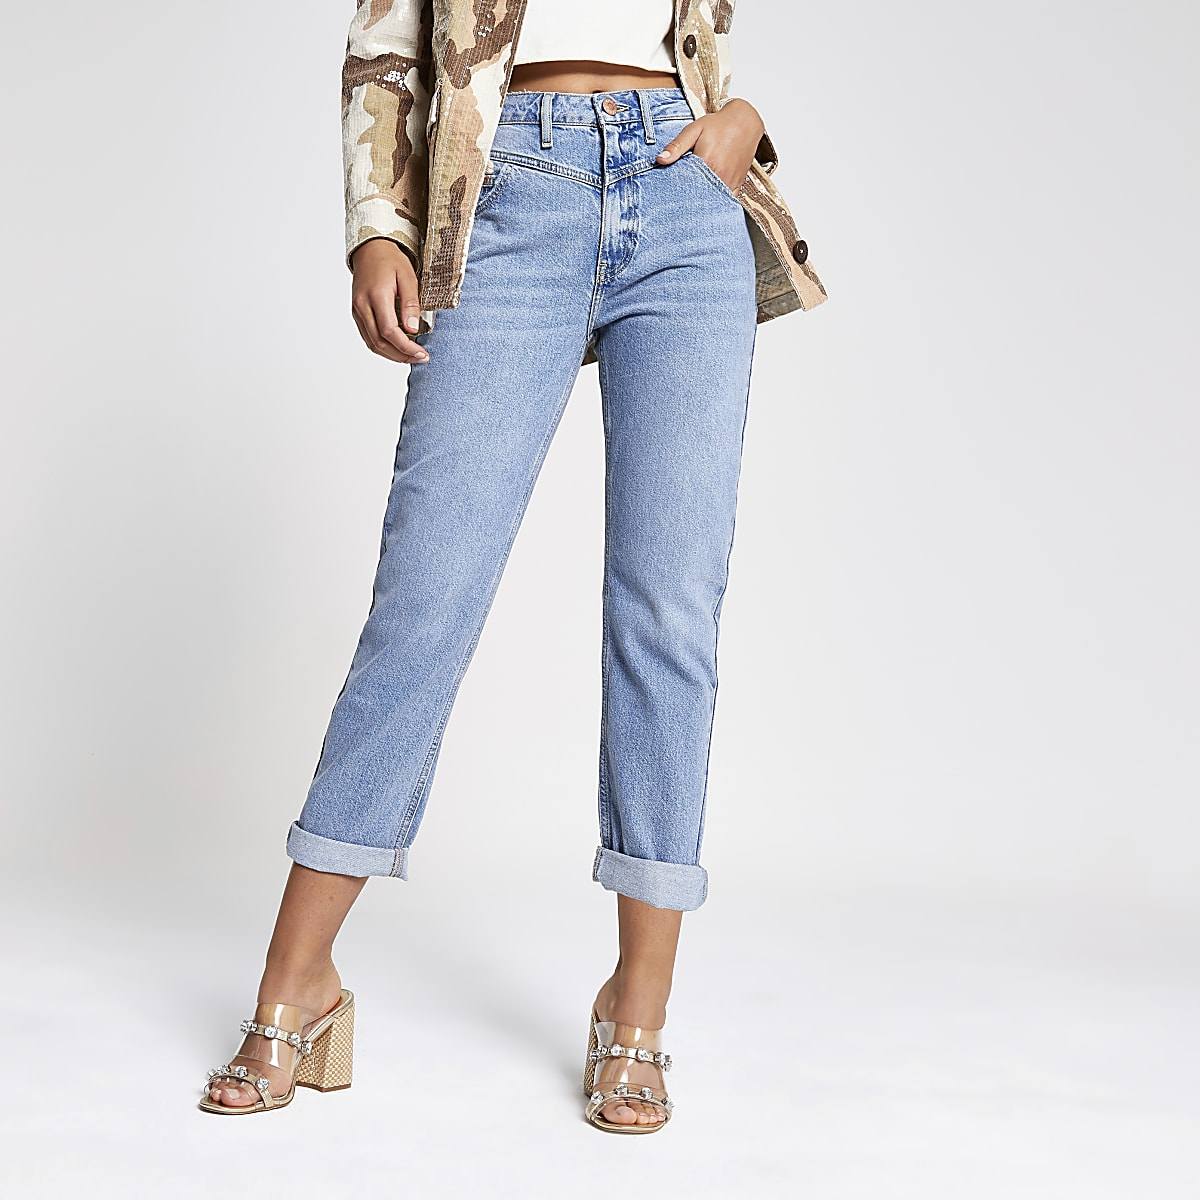 Middenblauwe mom jeans met hoge taille